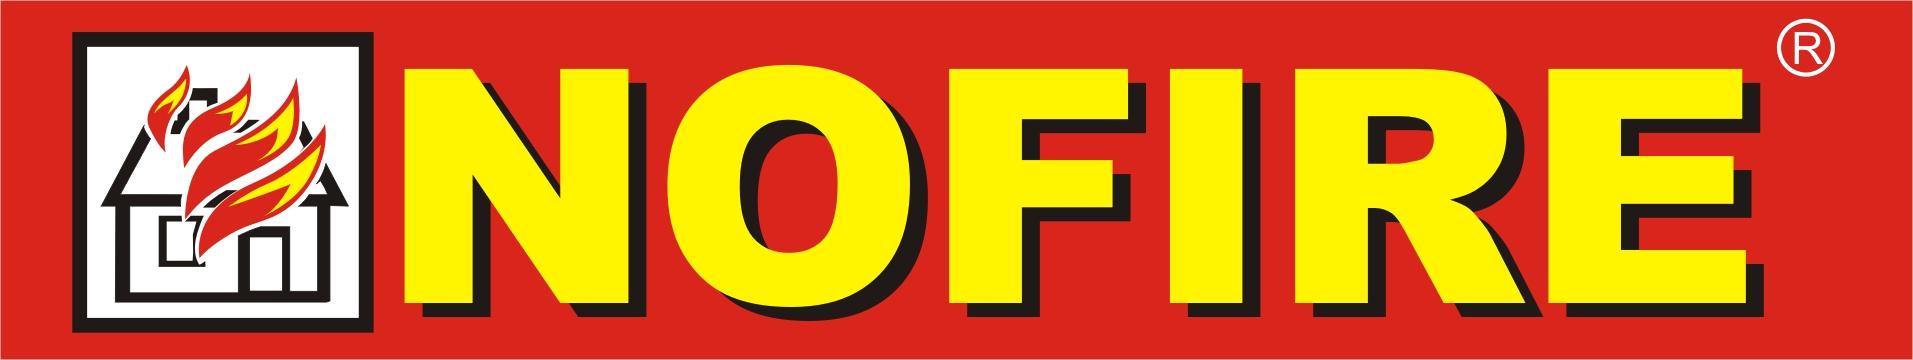 Logo_NOFIRE-4C_(1).jpg